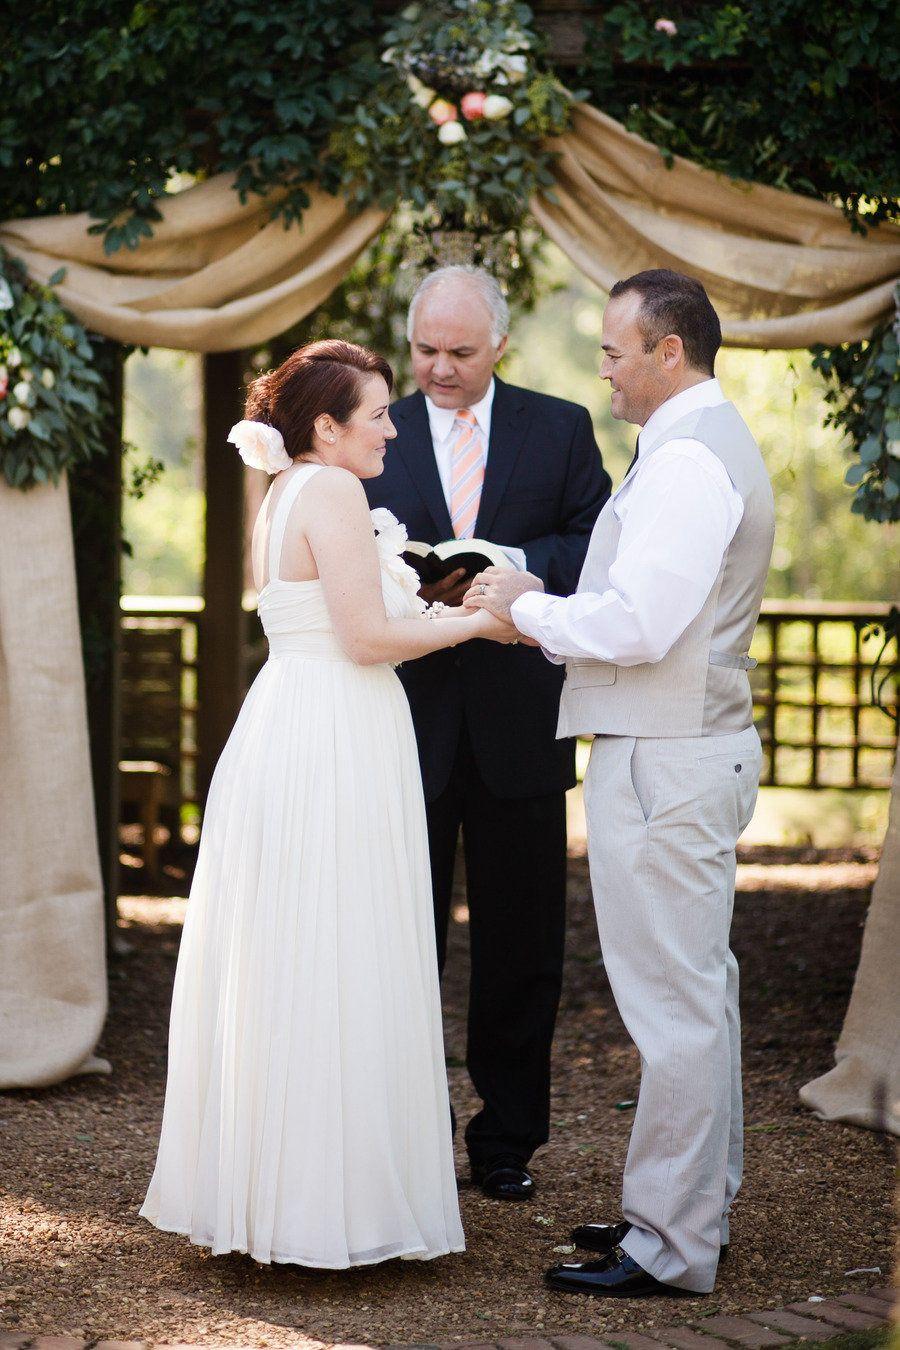 Jcrew wedding dress  Barnsley Gardens Wedding by Elle Golden Photography  Gardens